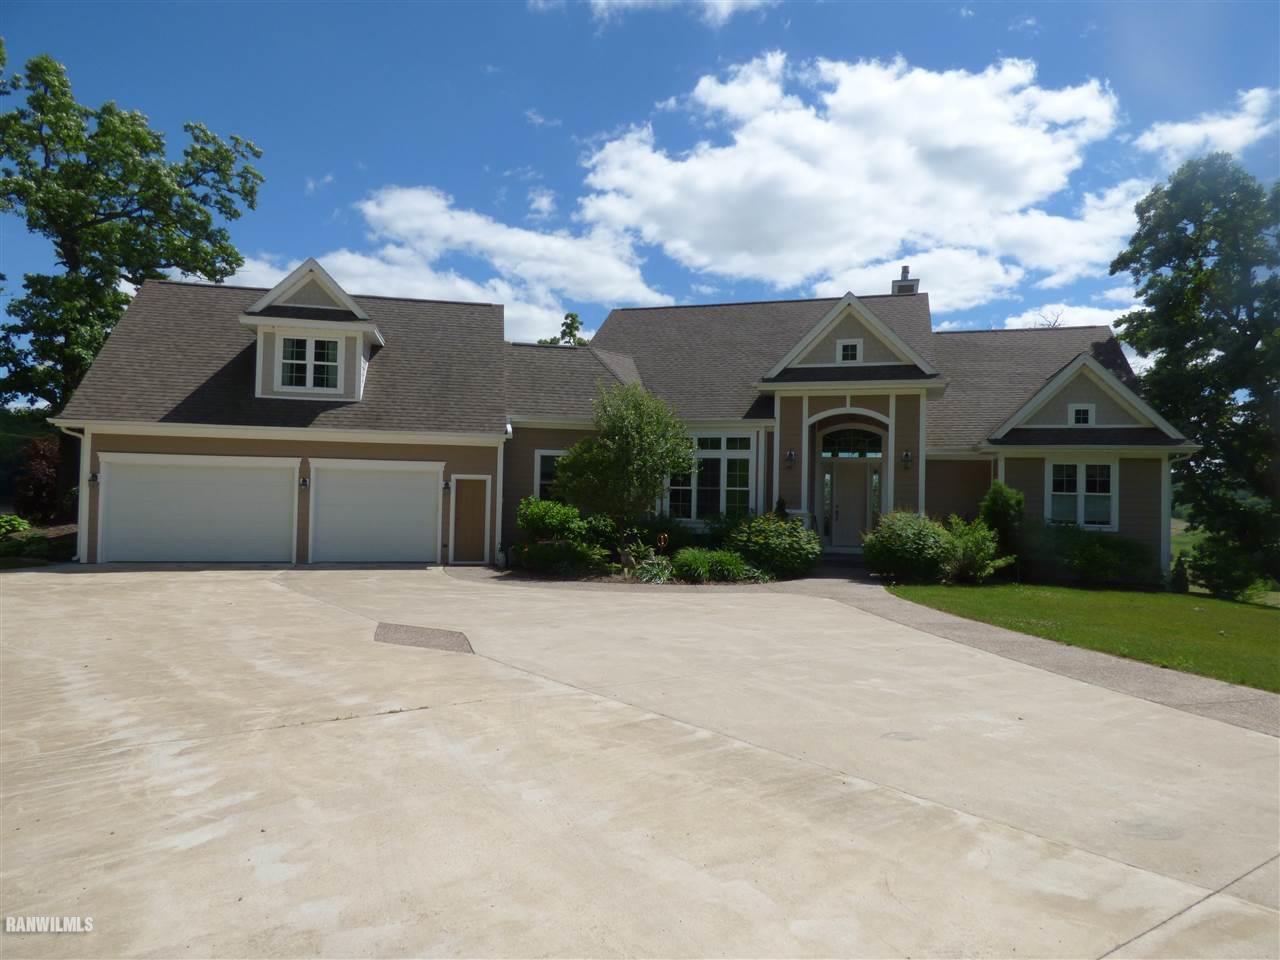 Image of  for Sale near Elizabeth, Illinois, in Jo Daviess County: 160.74 acres